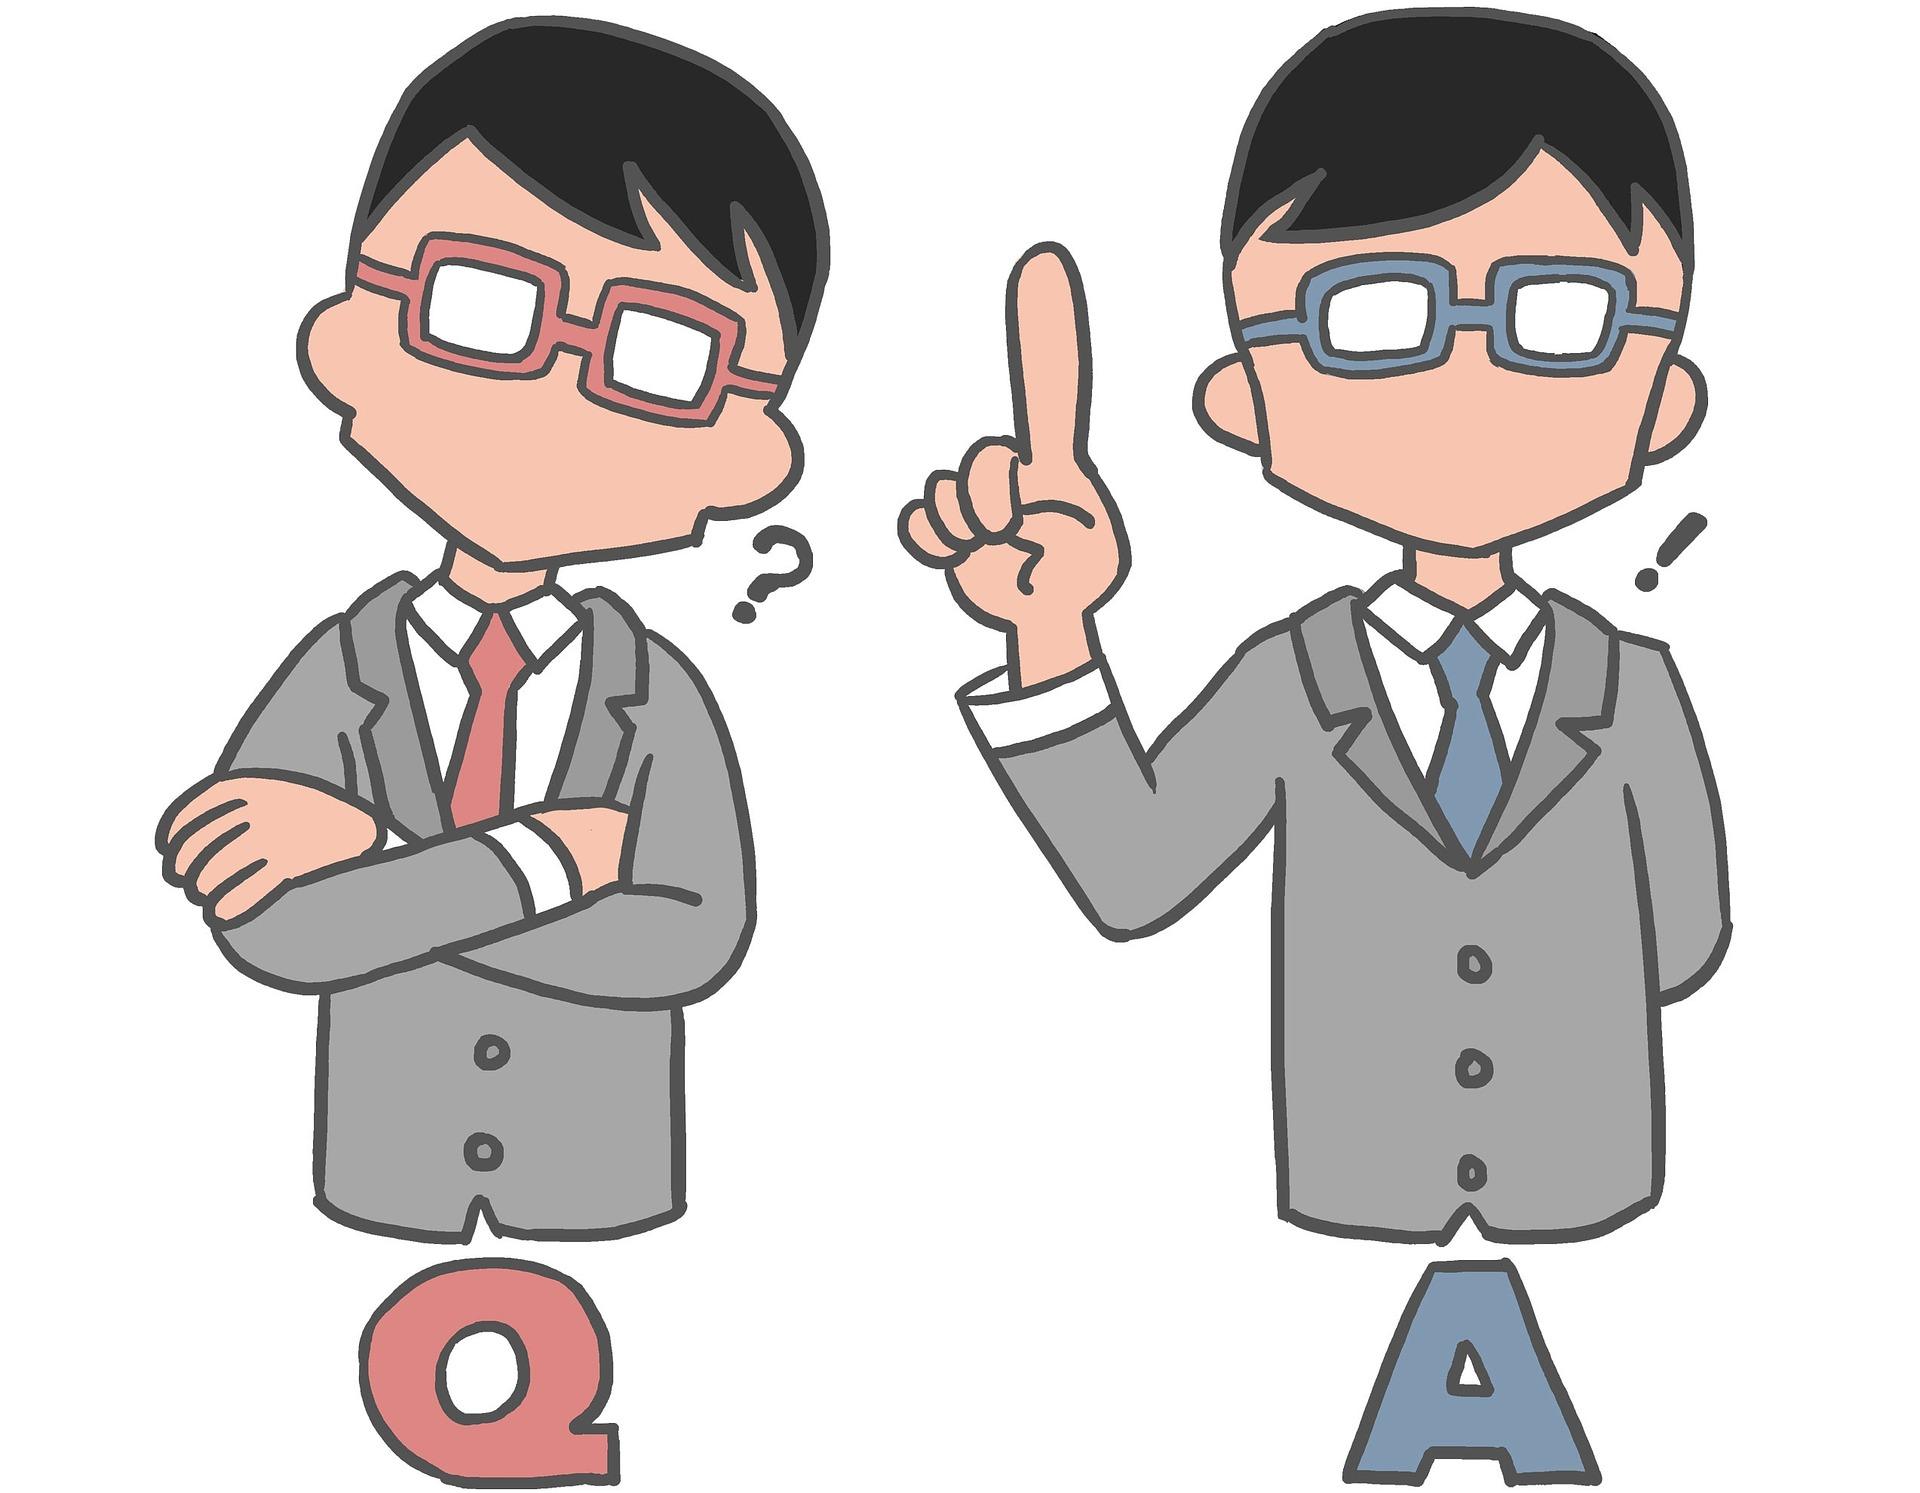 japanese-1206509_1920